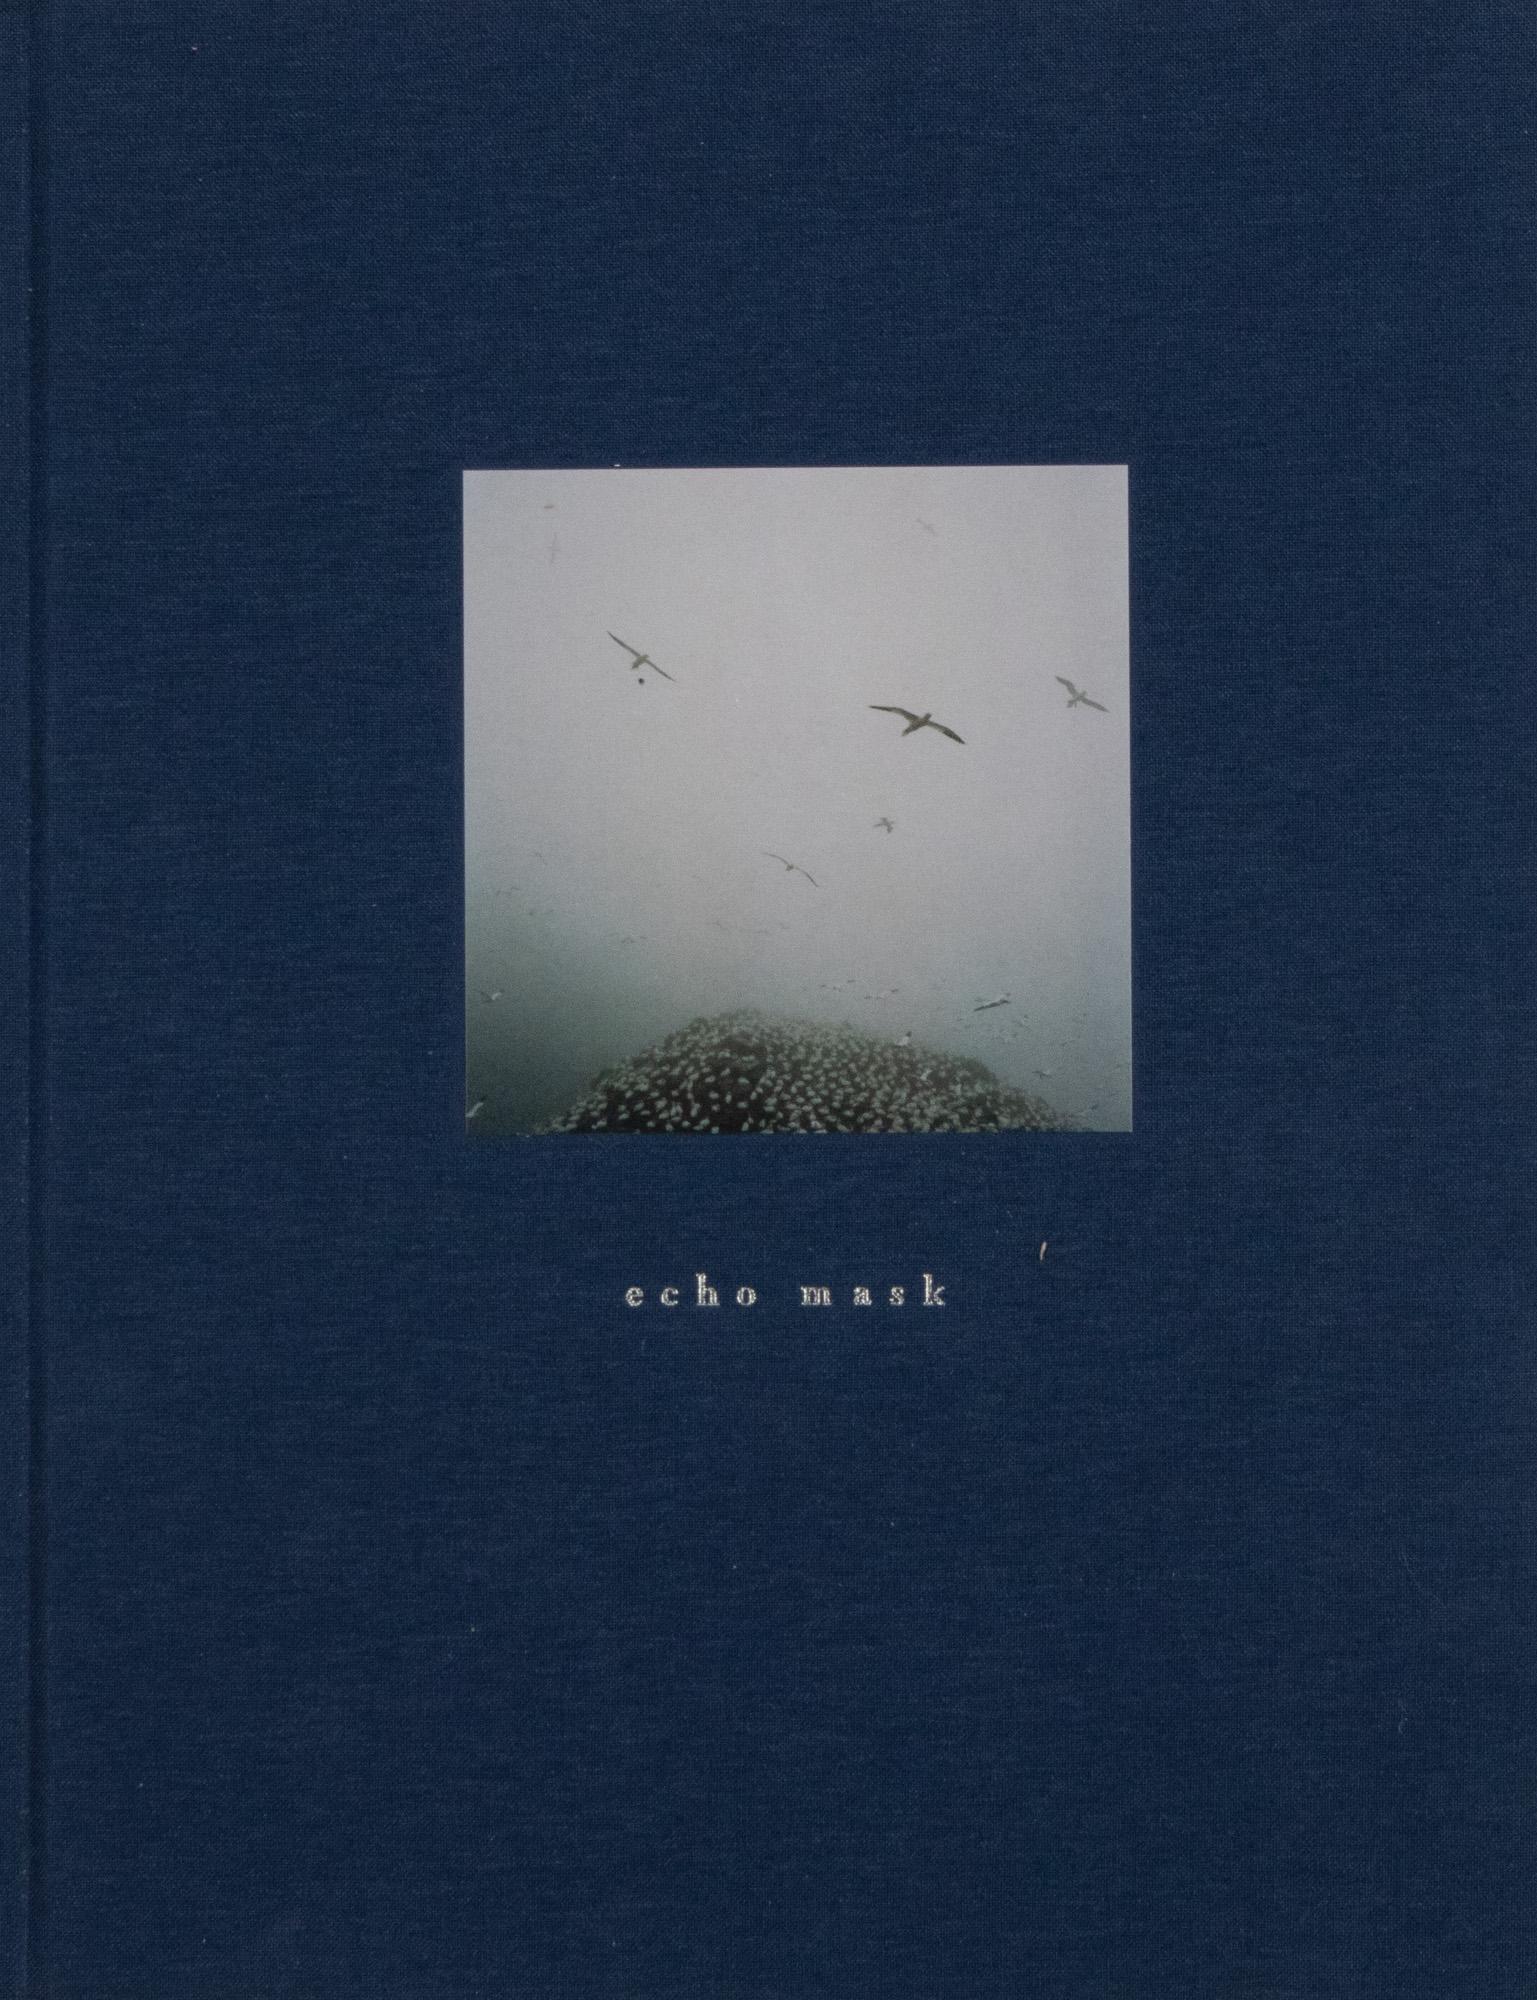 https://www.photoeye.com/bookstore/citation.cfm?catalog=ZJ032